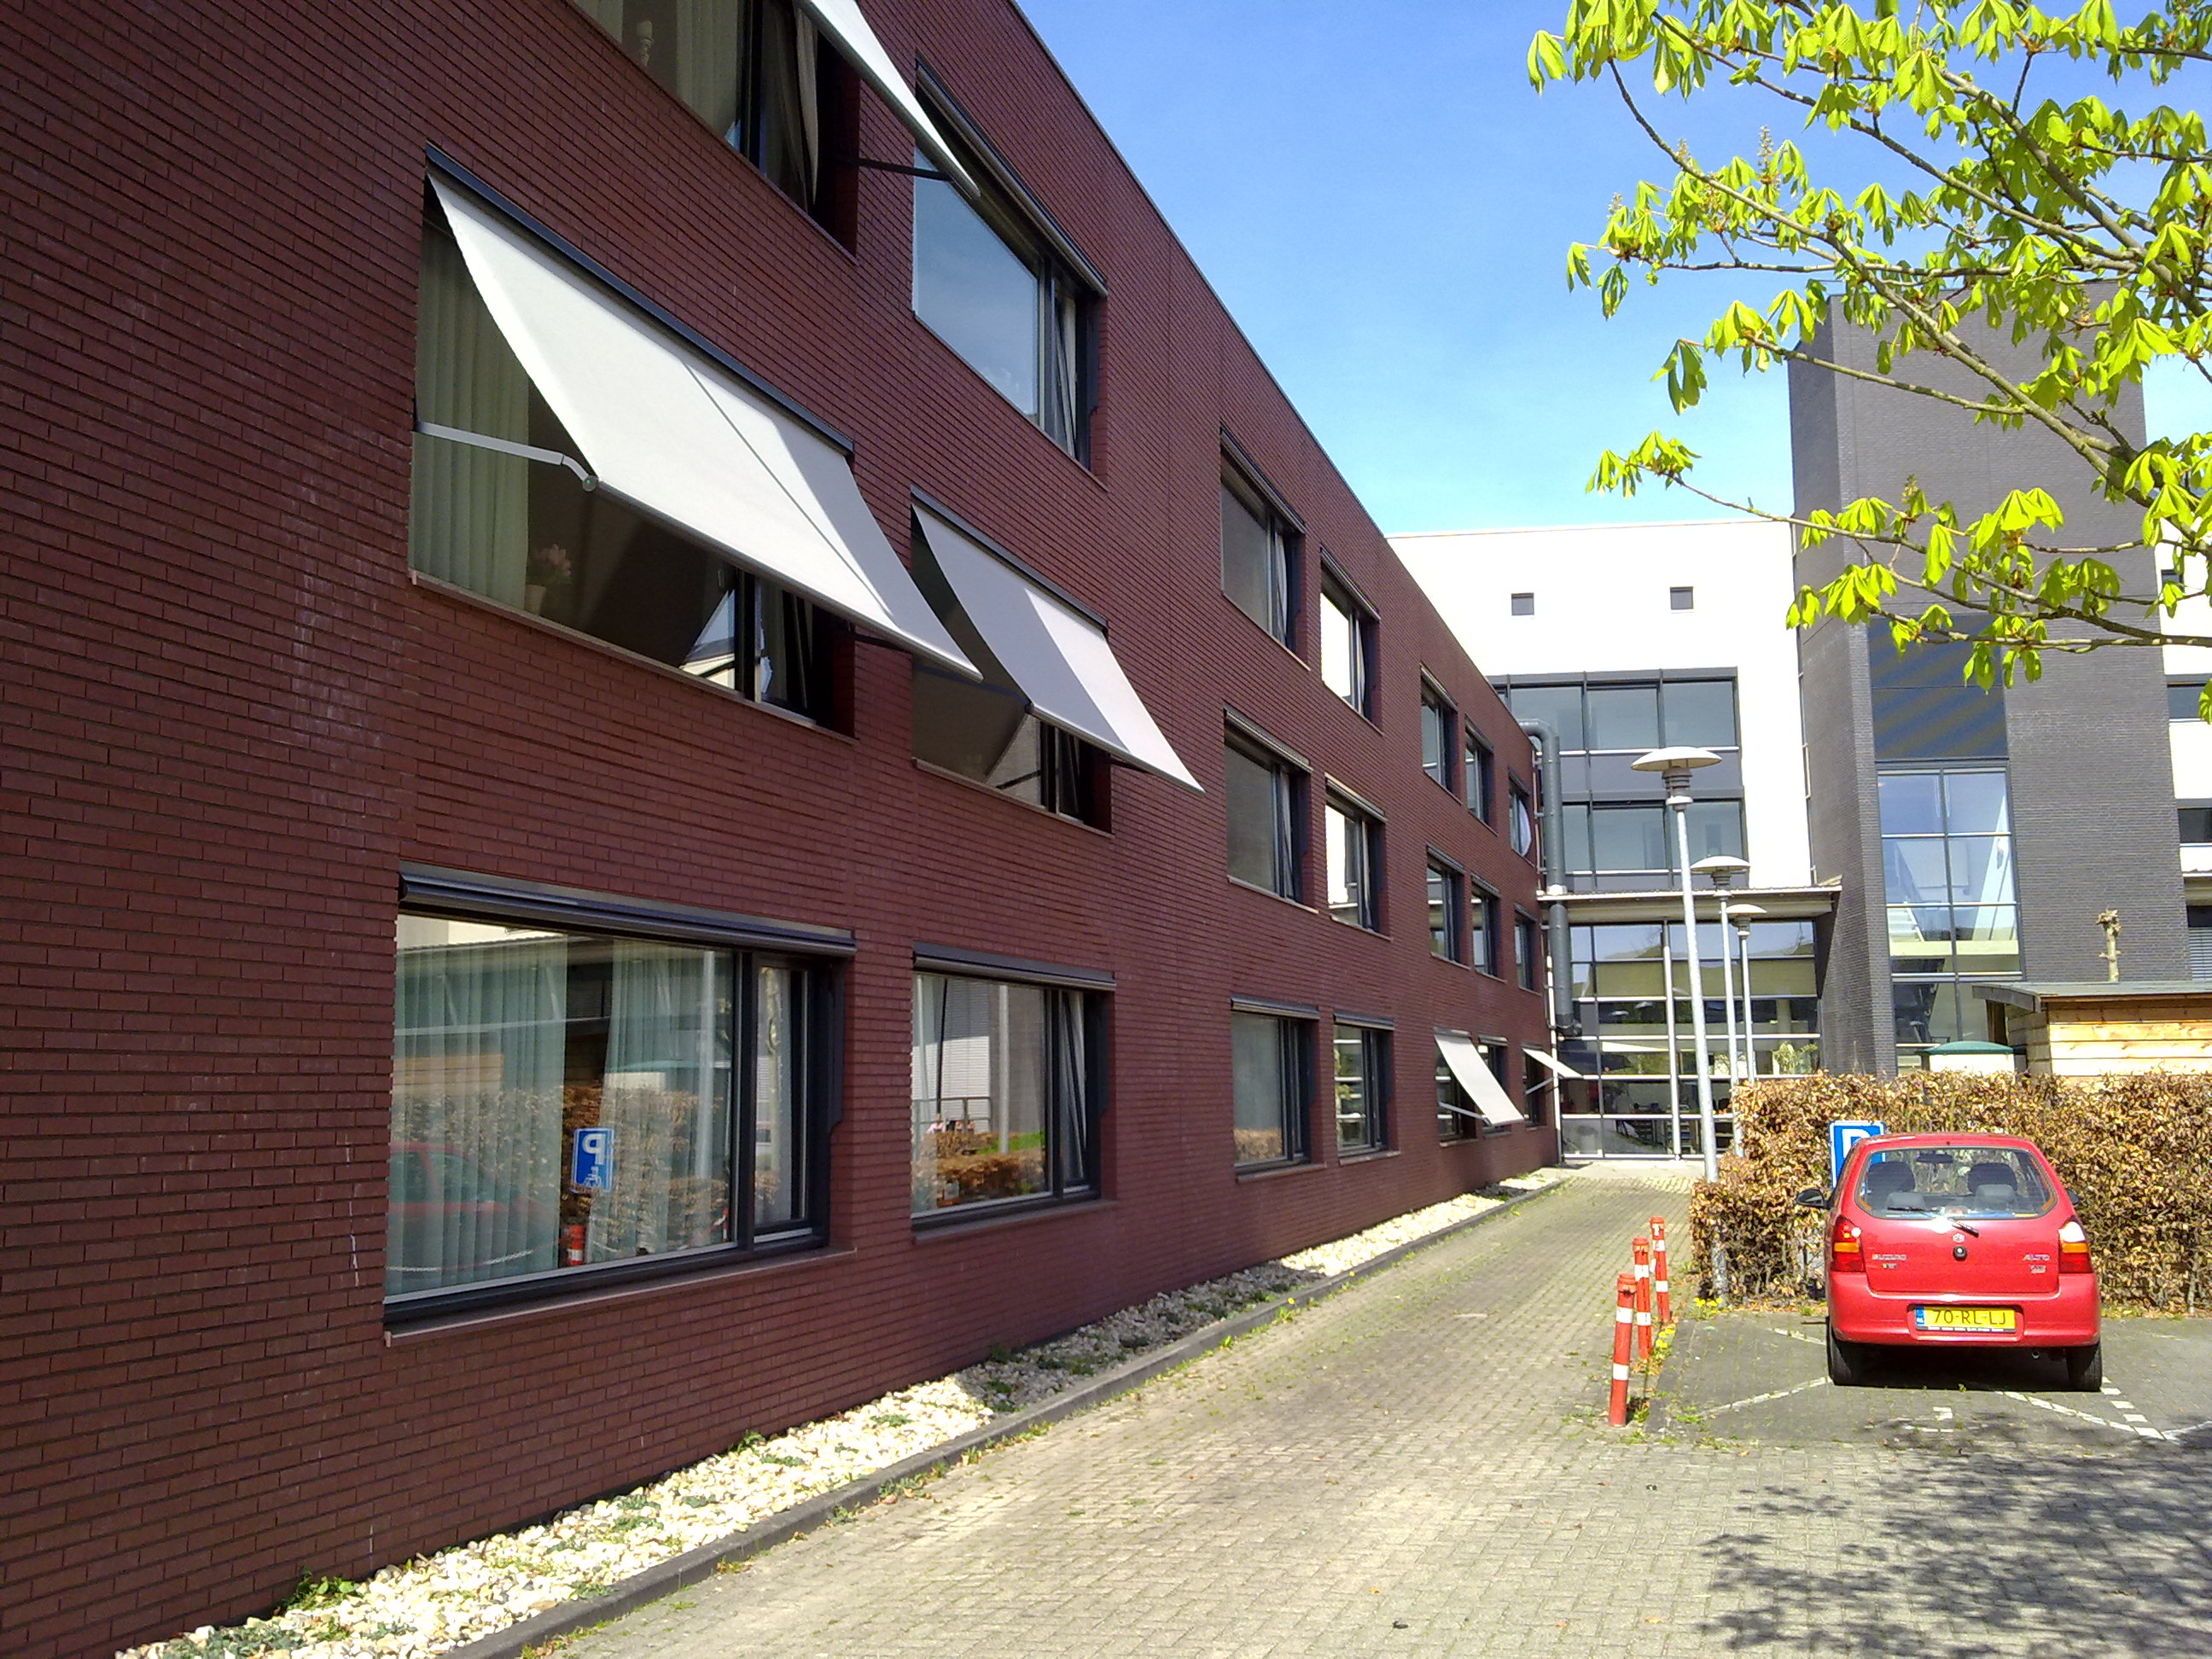 Woon- zorgcentrum Westerwiek Breda 010